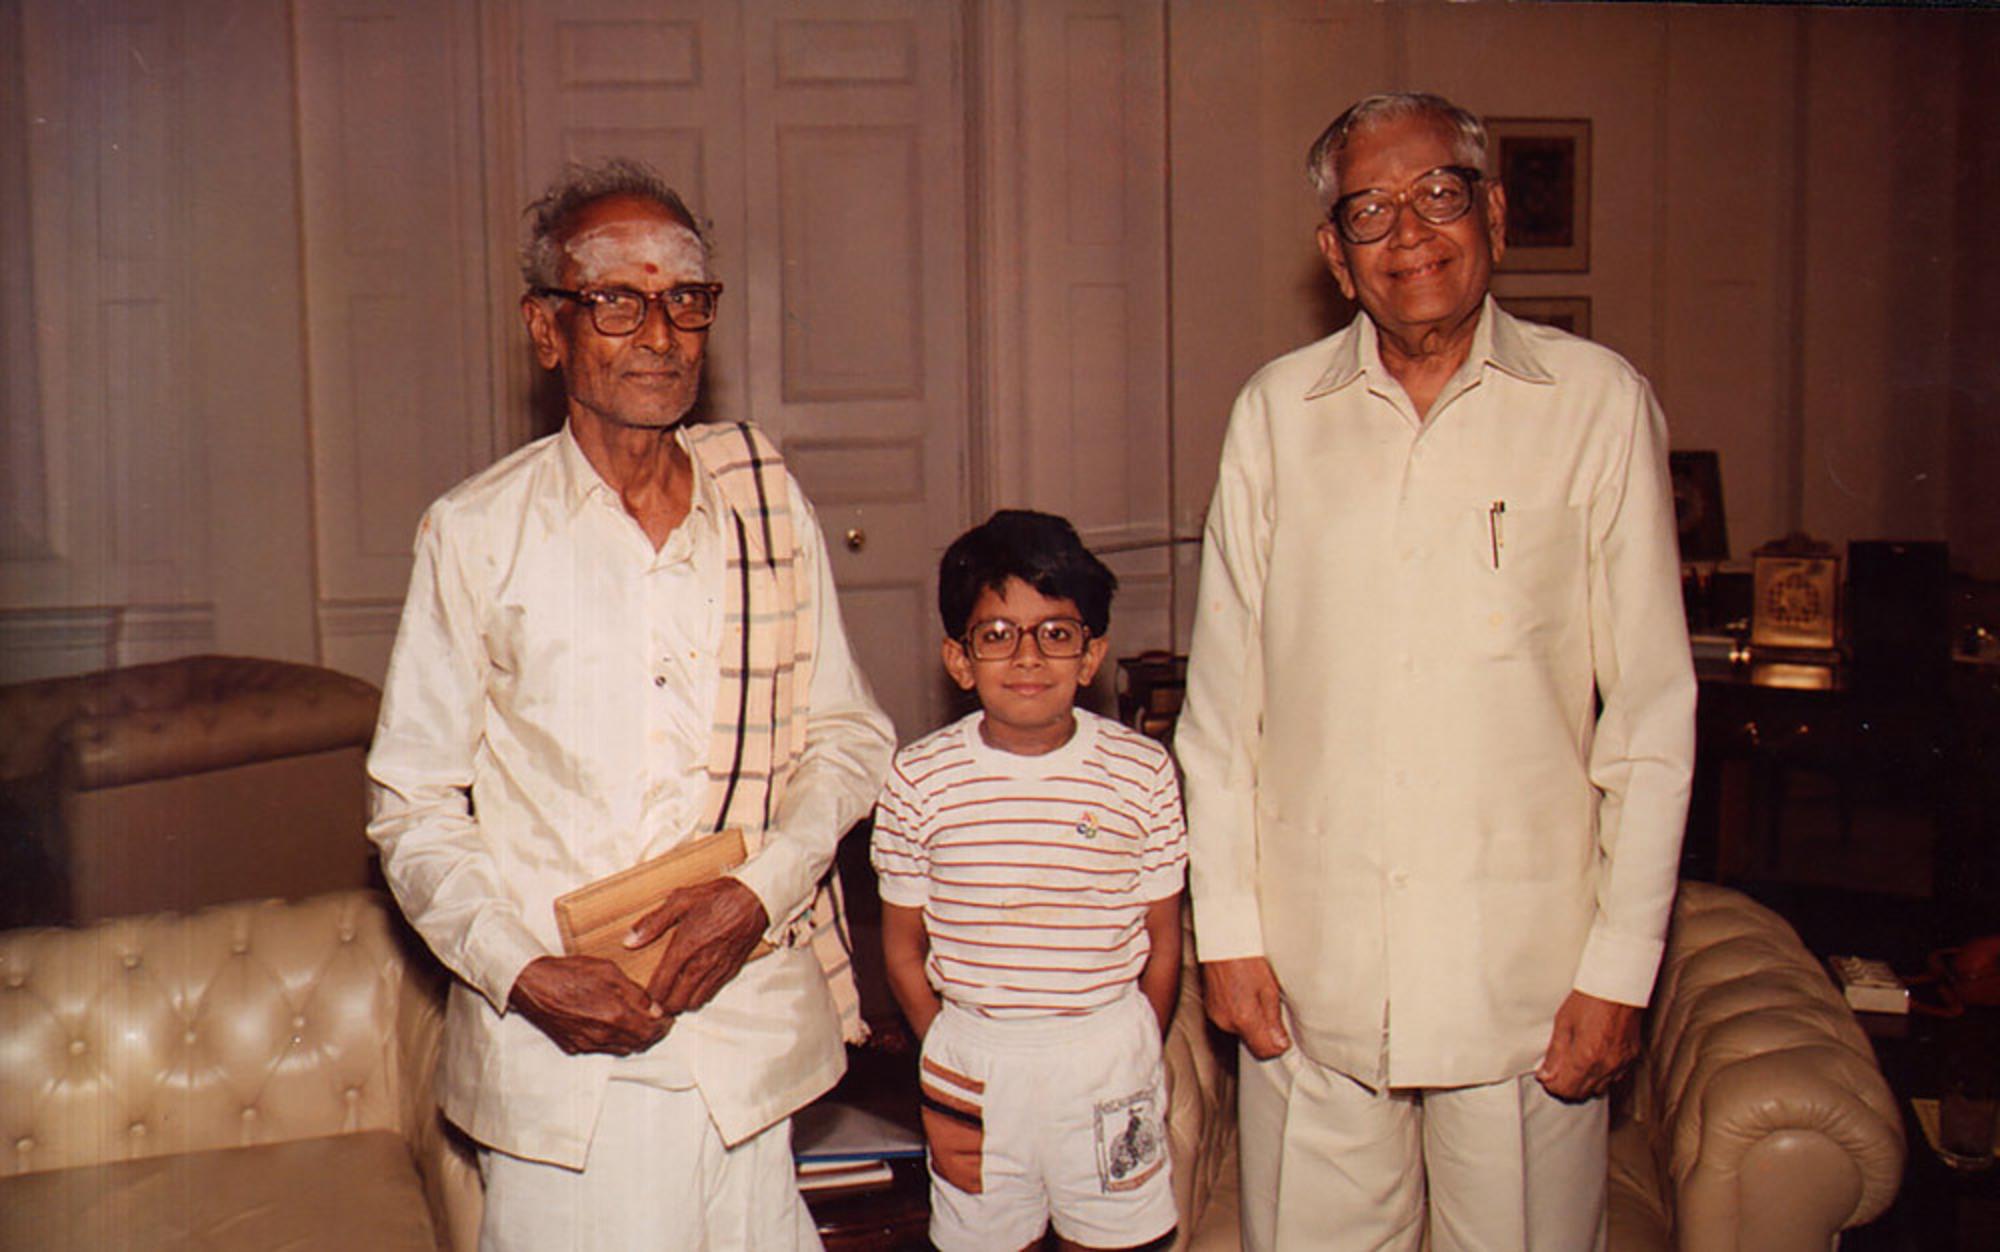 My grandfather's vagabond past – Samanth Subramanian